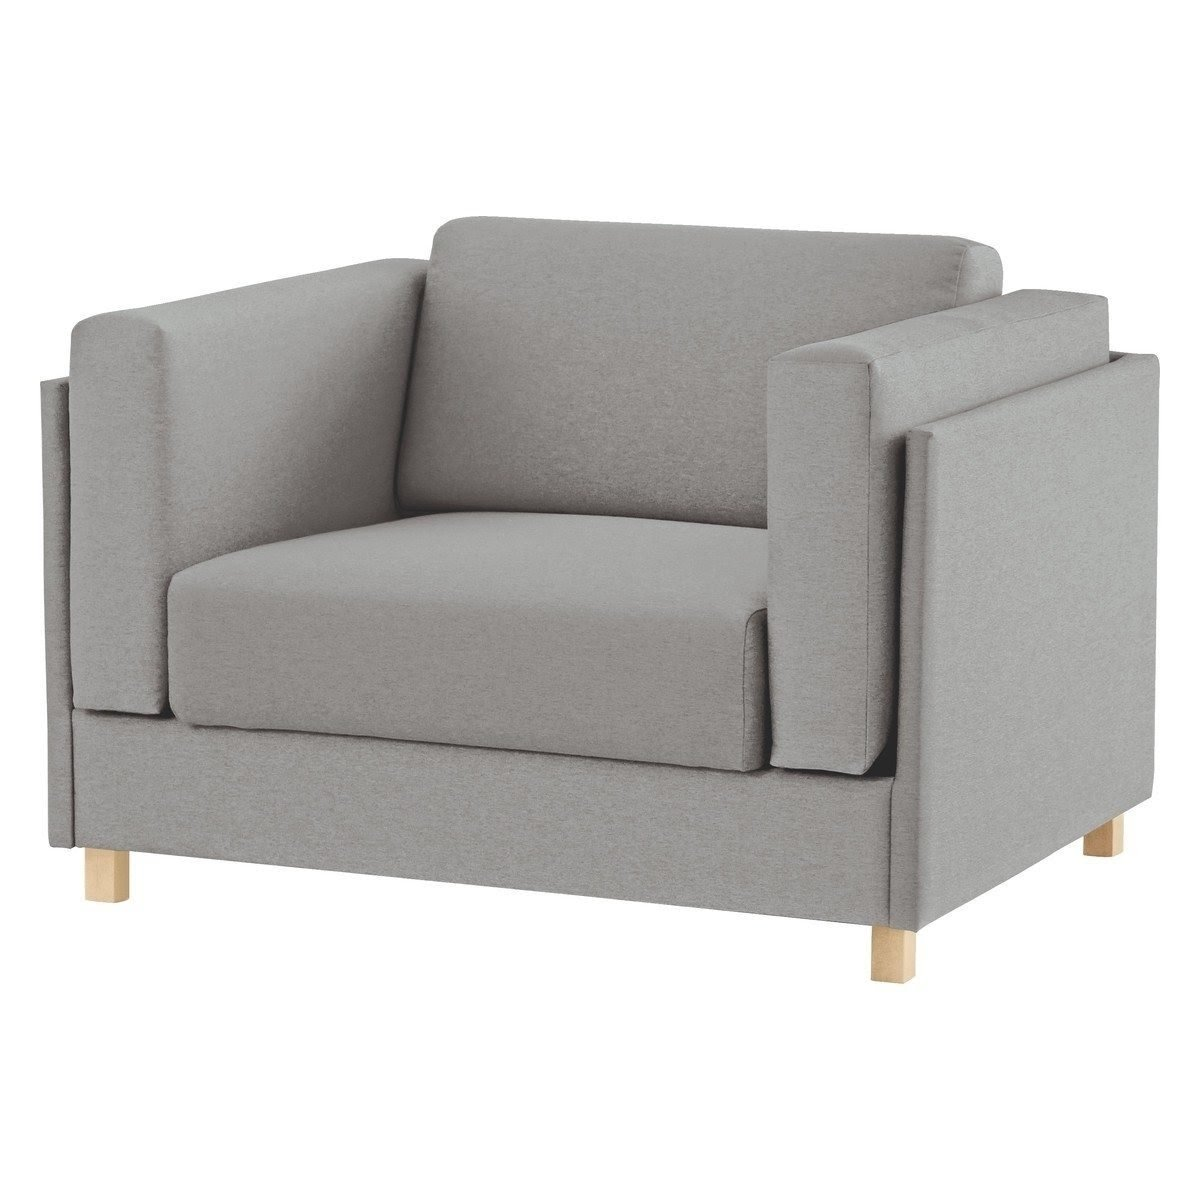 Single Sofa Bed Chair Uk U2013 Hereo Sofa